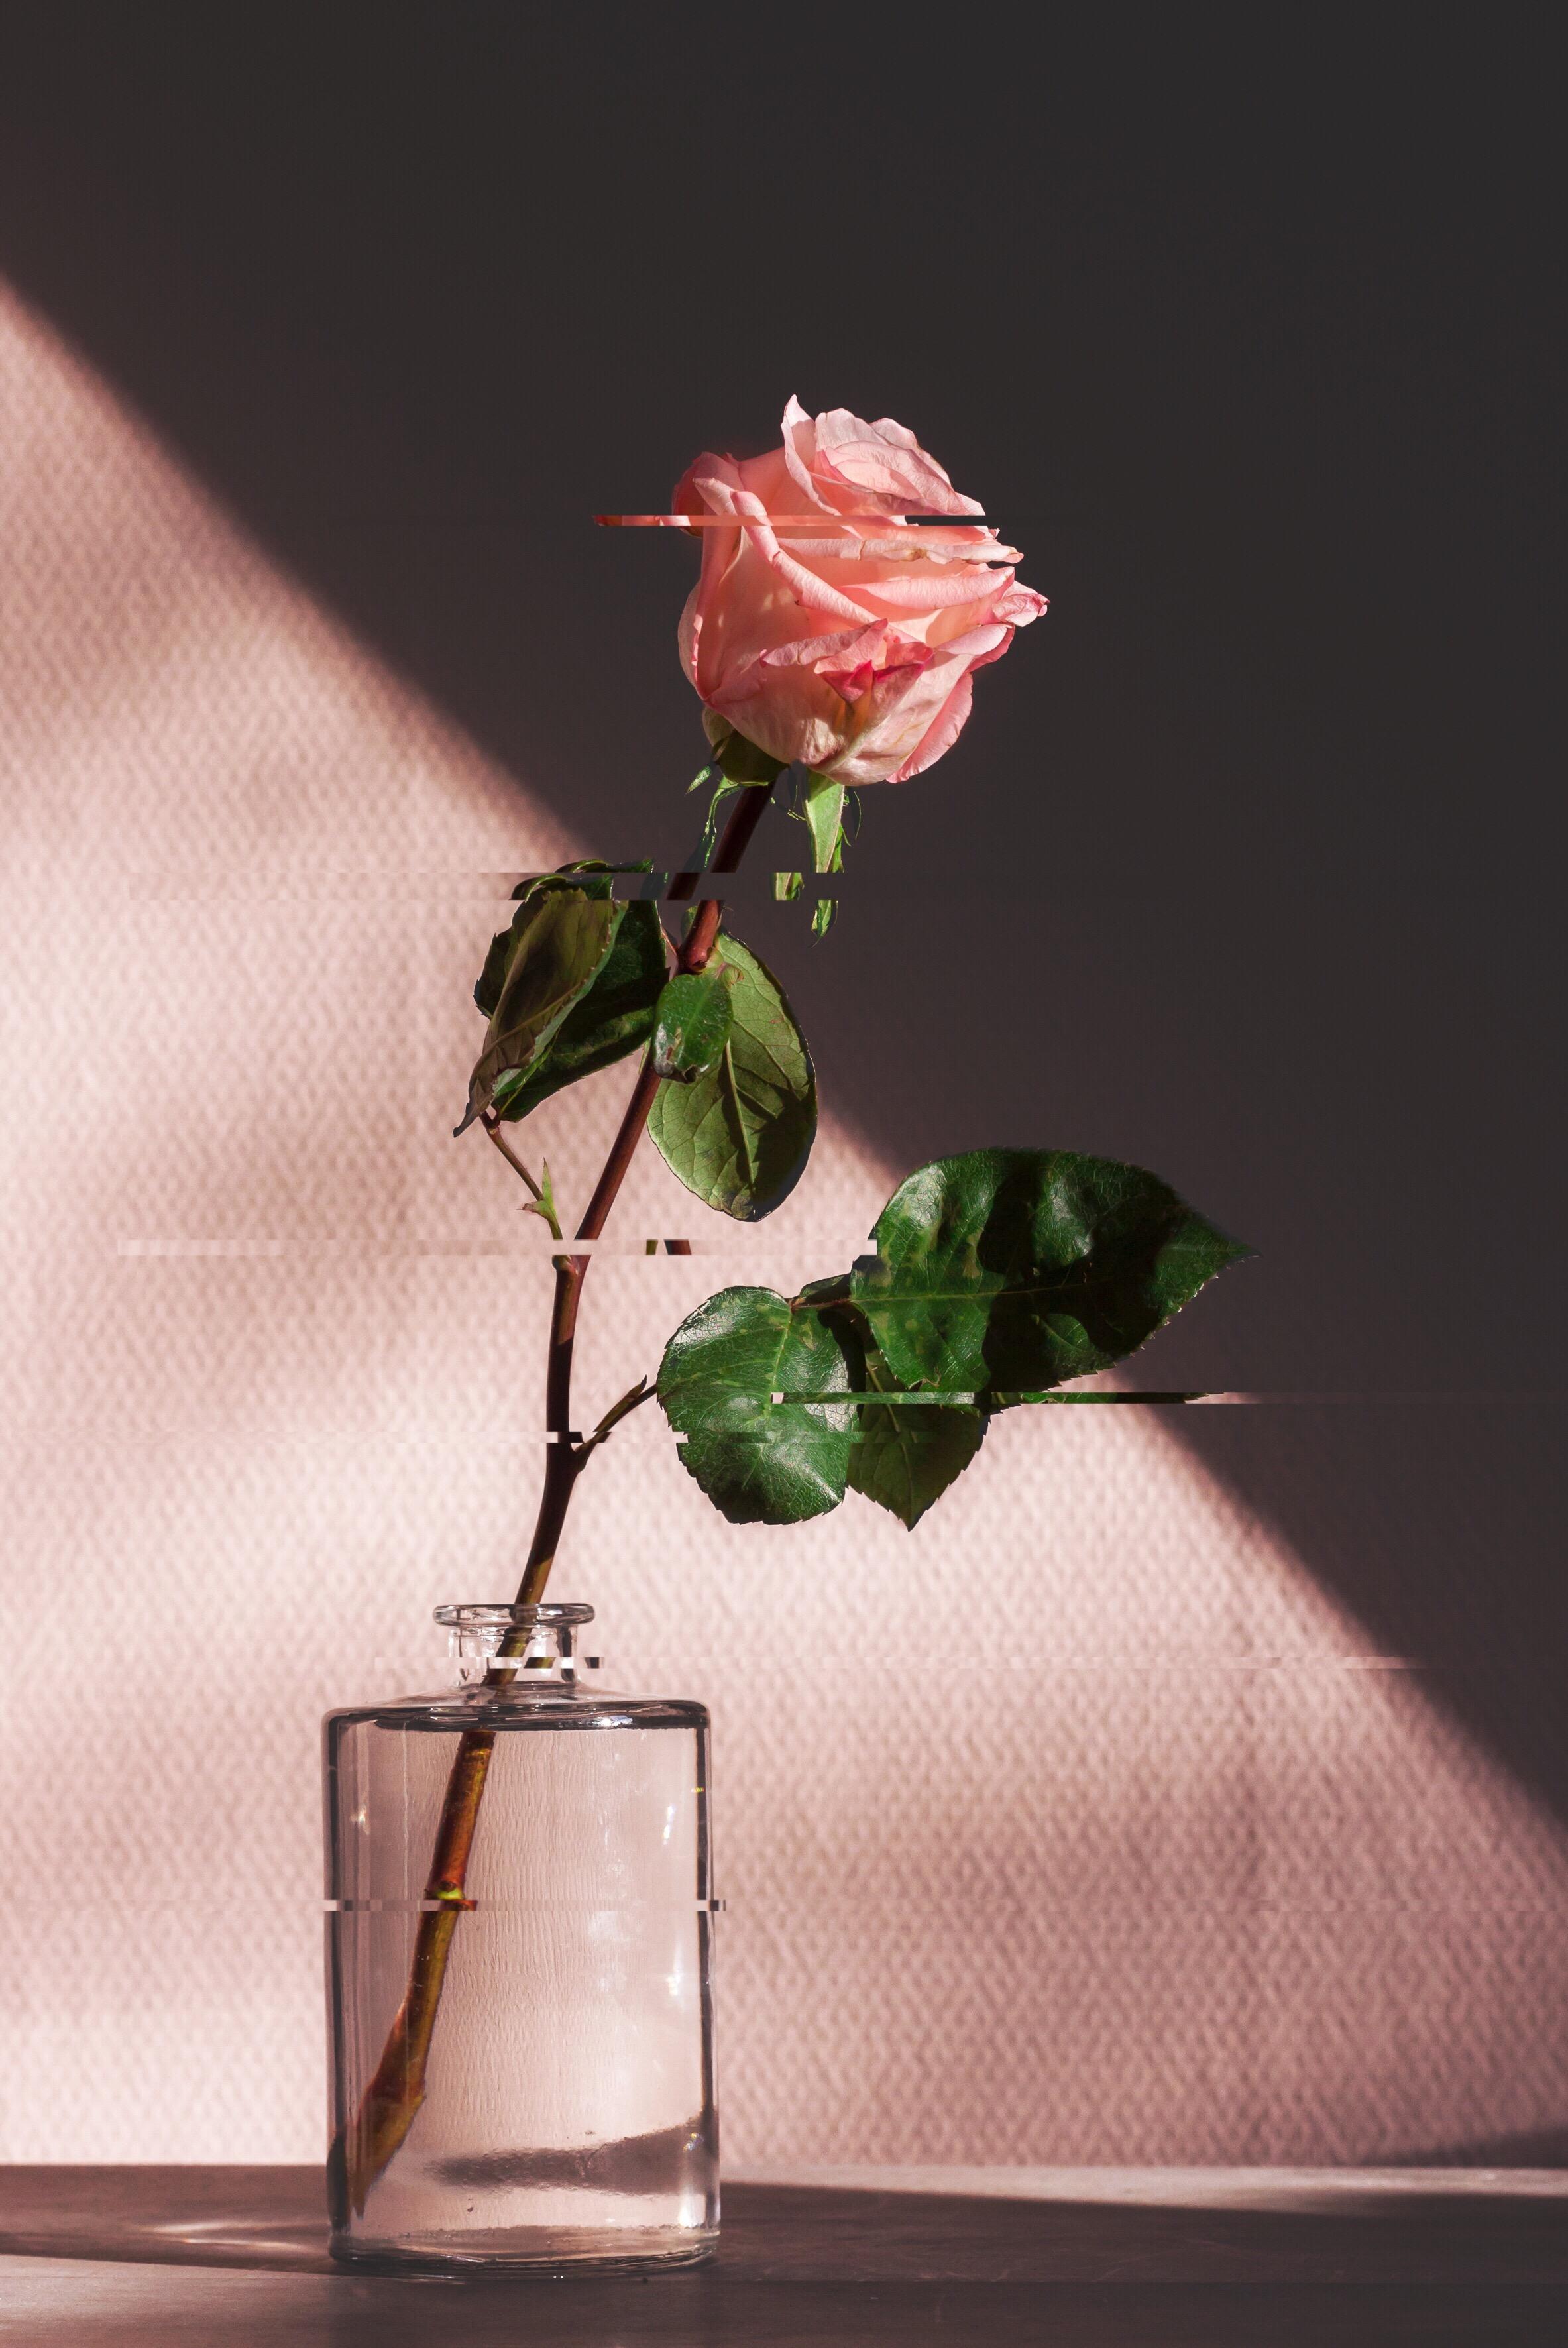 Glitched love. rose glitch pink vintage tumblr edit mye...